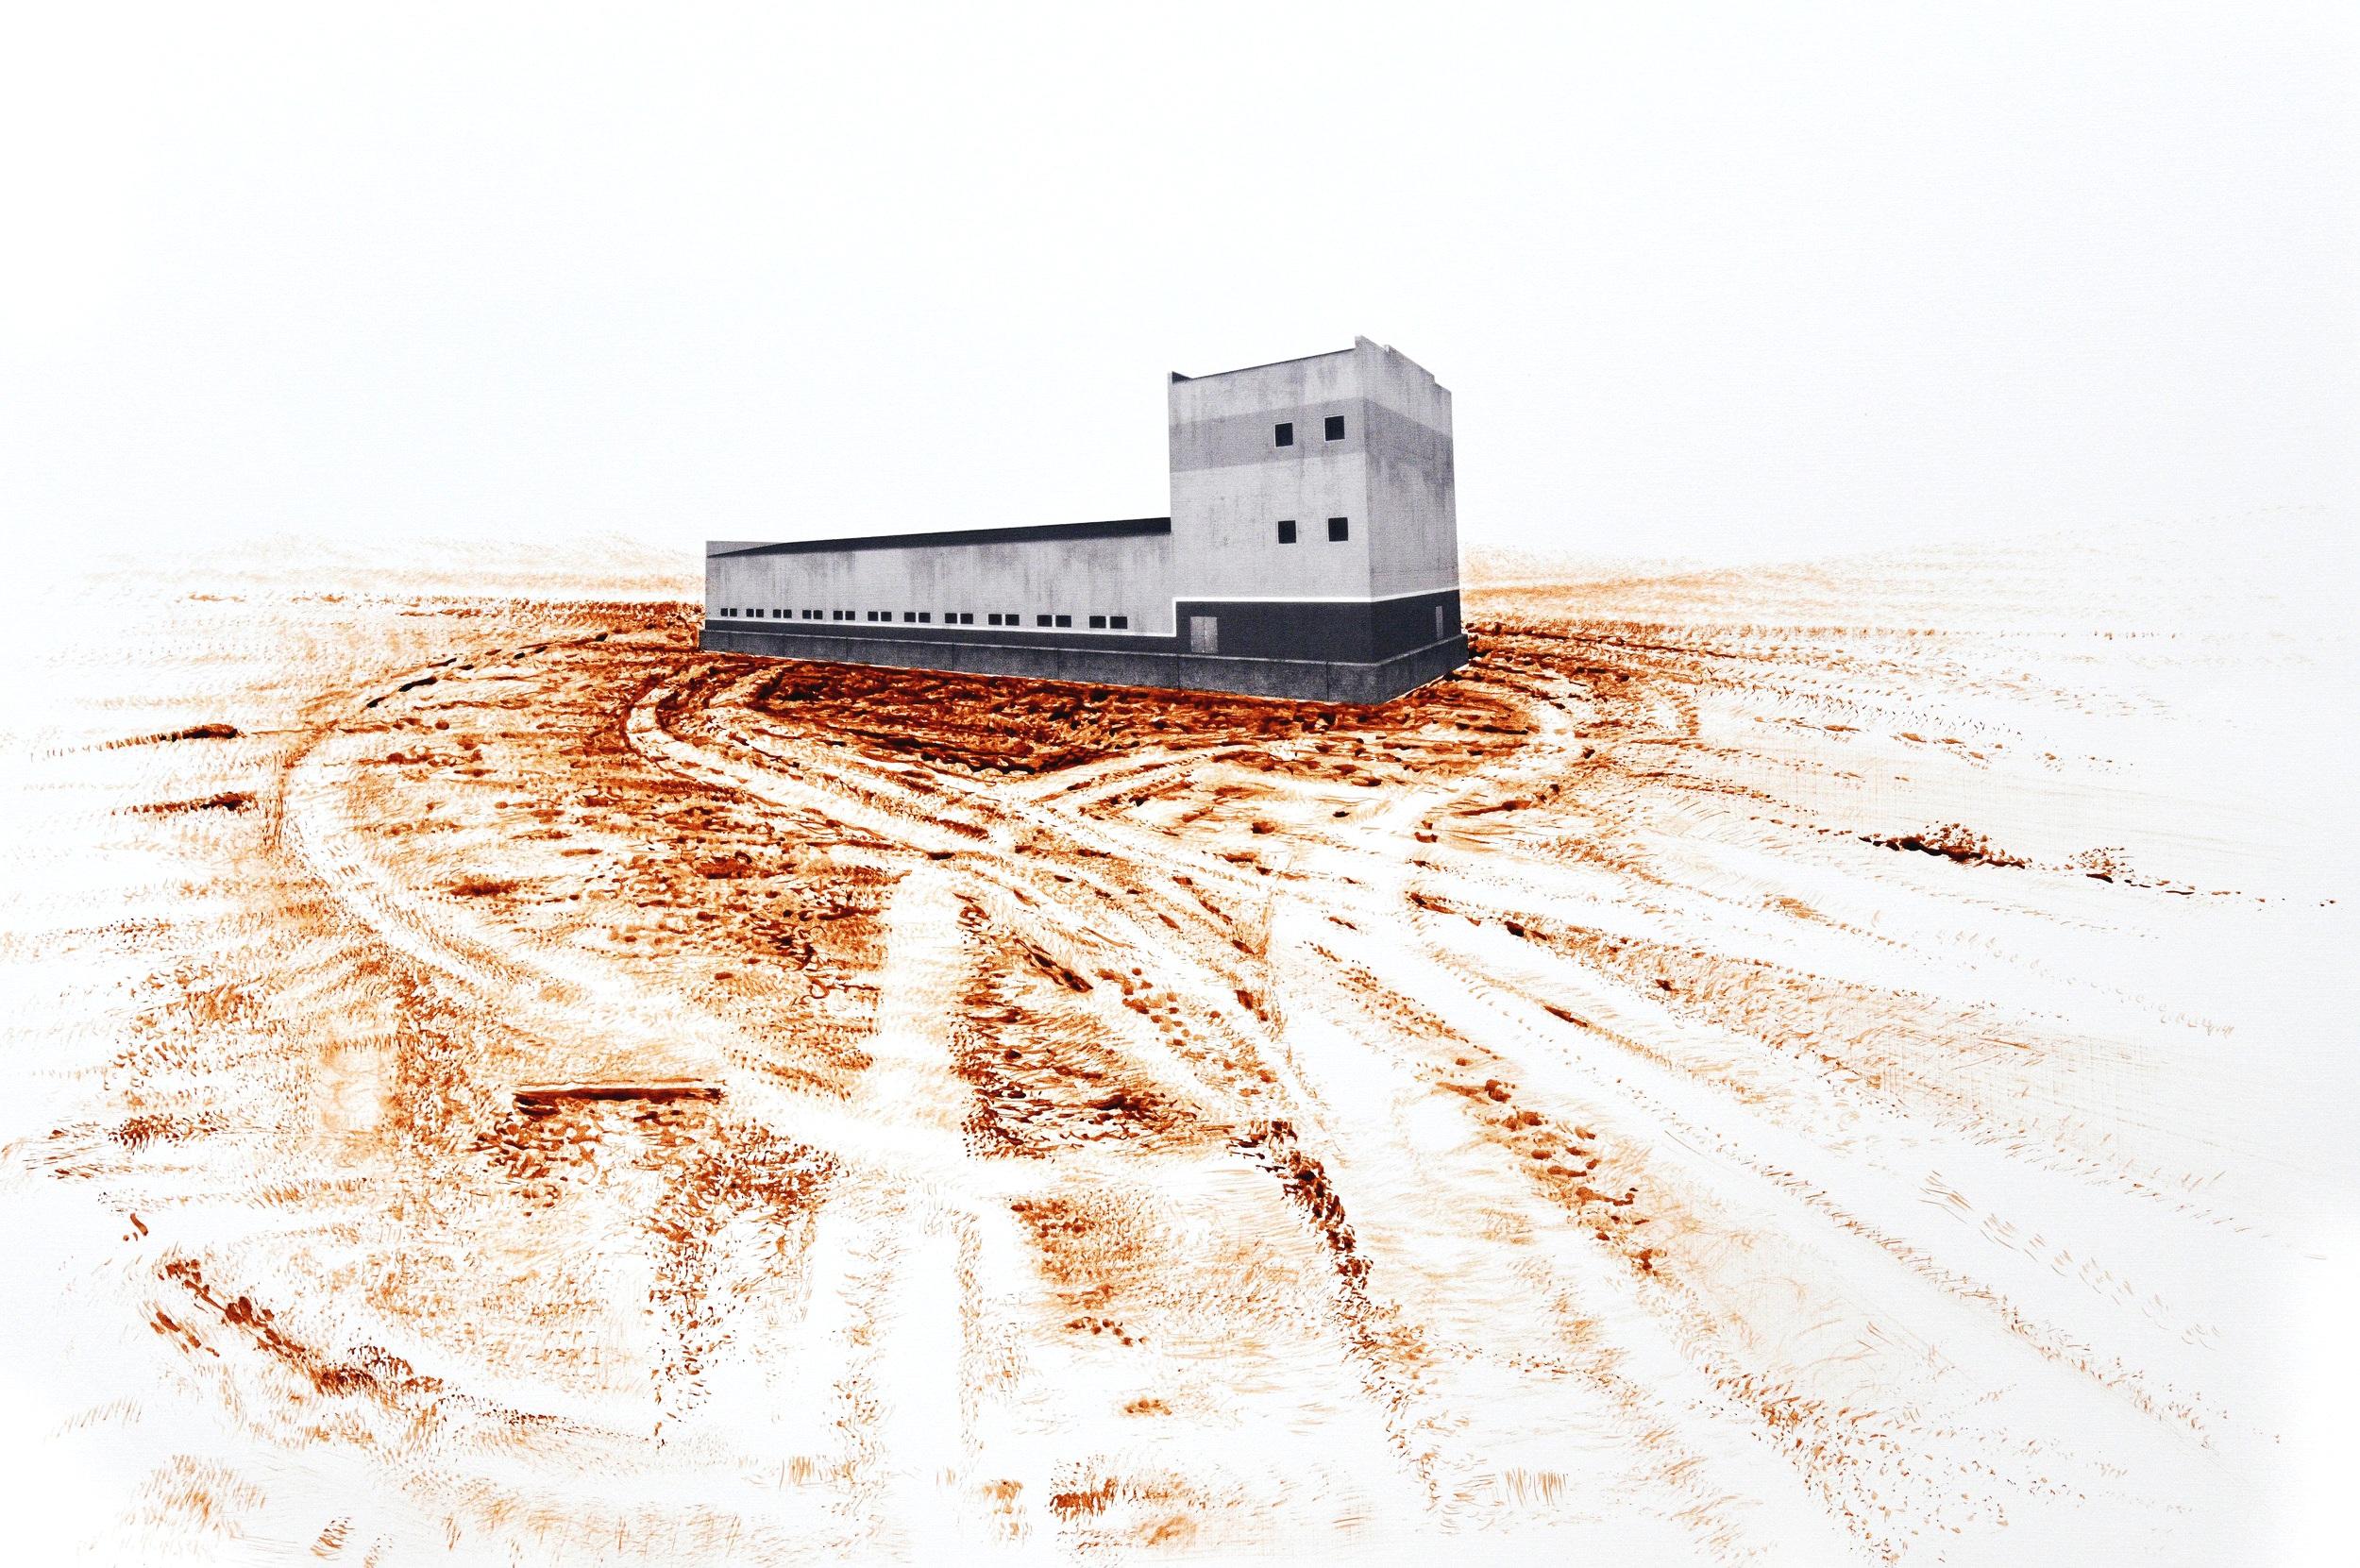 S.T, de la serie Érase un lugar (2019) -  50 x 70 cm - Tinta e impresión digital sobre papel / Ink and digital print on paper